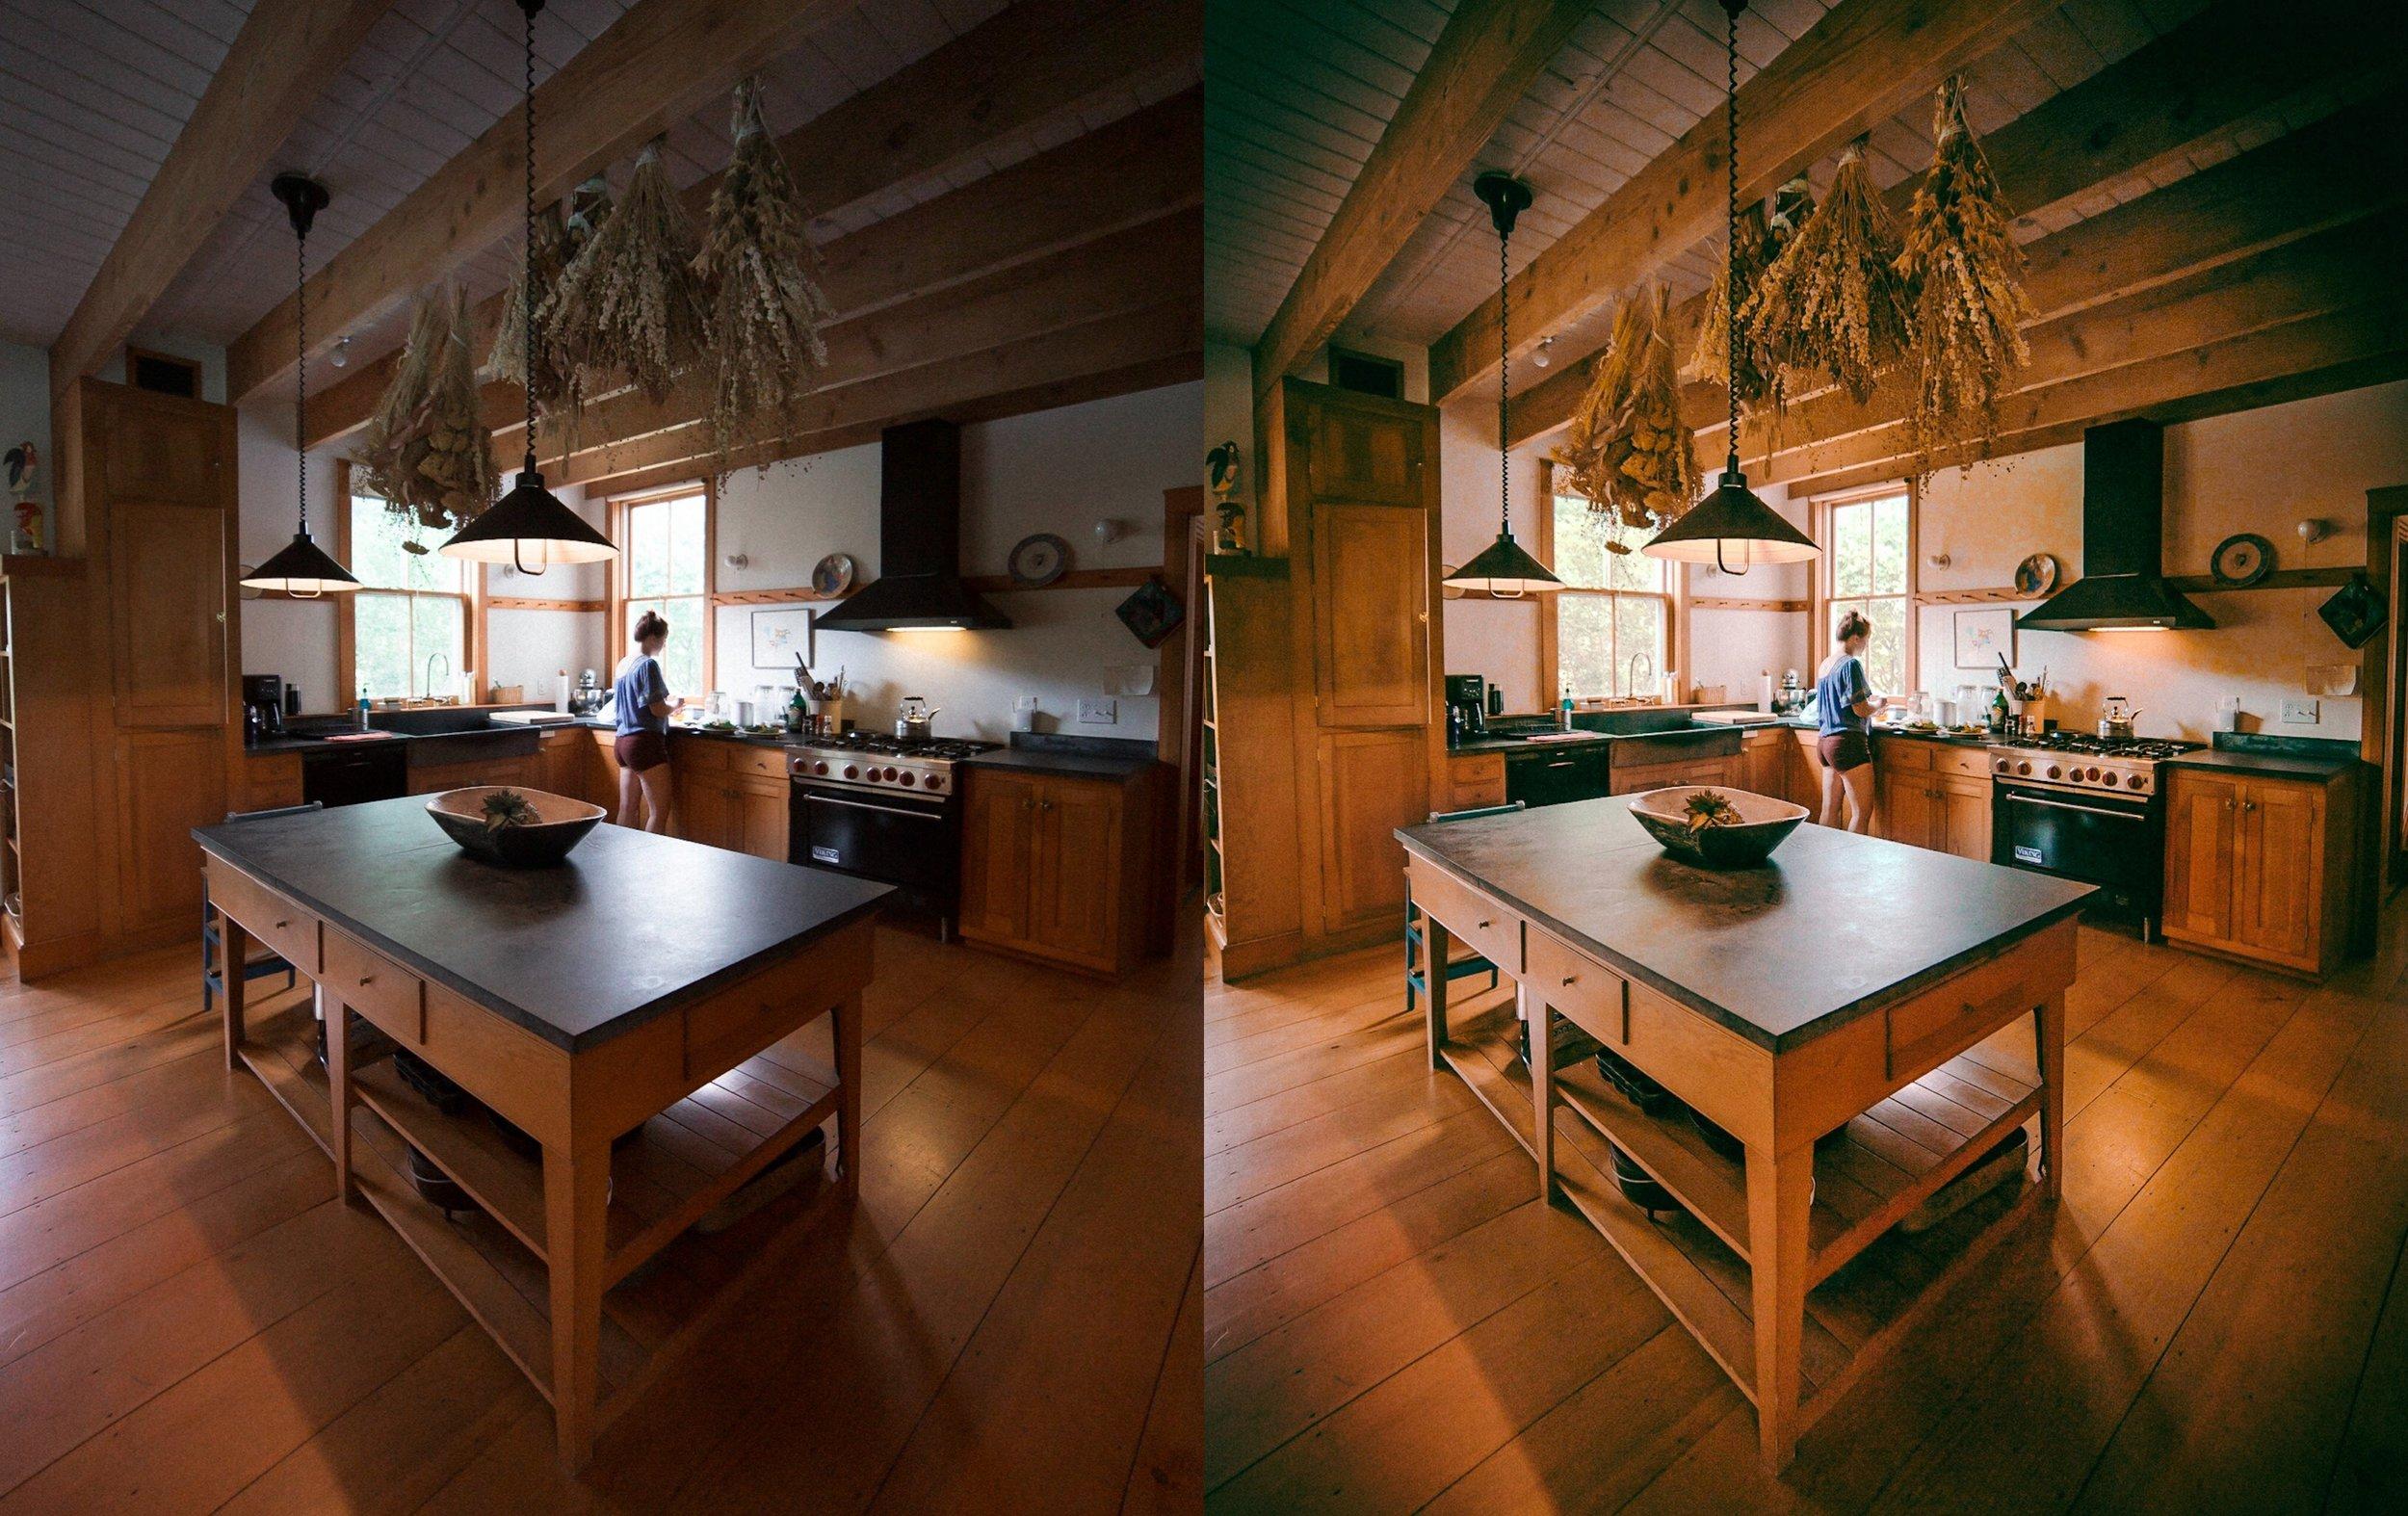 Warm Farmhouse Interior